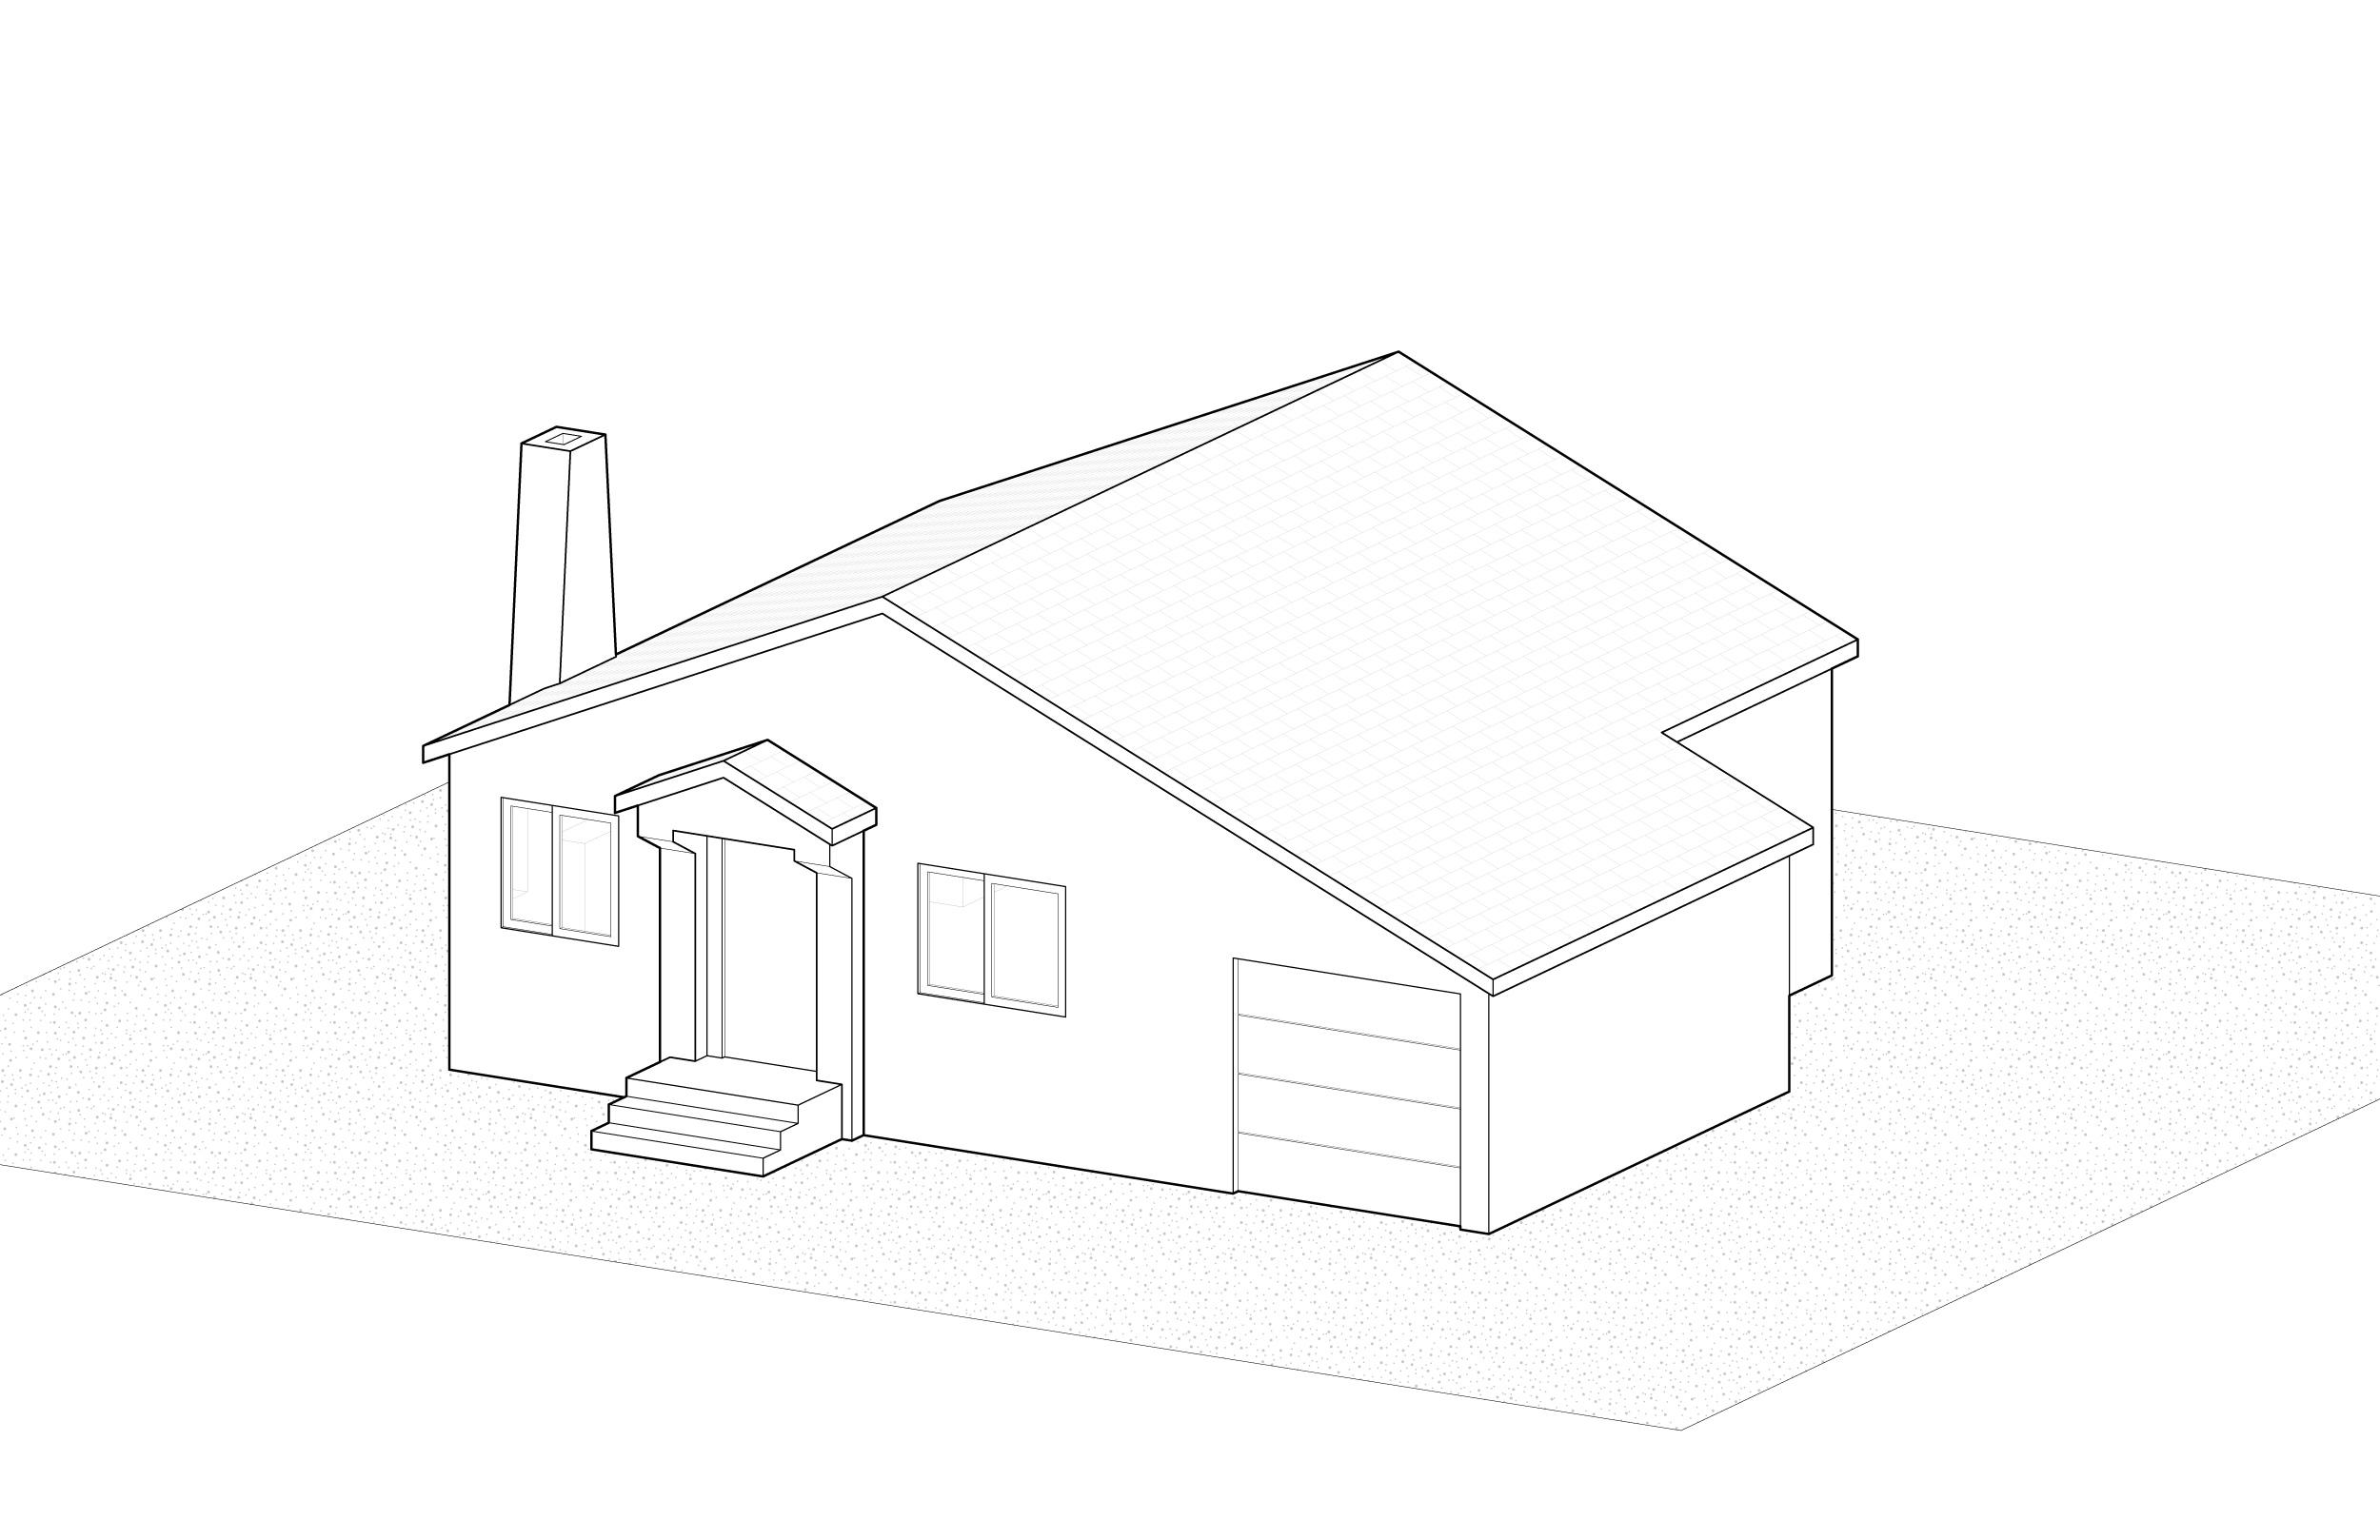 Rosewood-House_Diagram_01.jpg